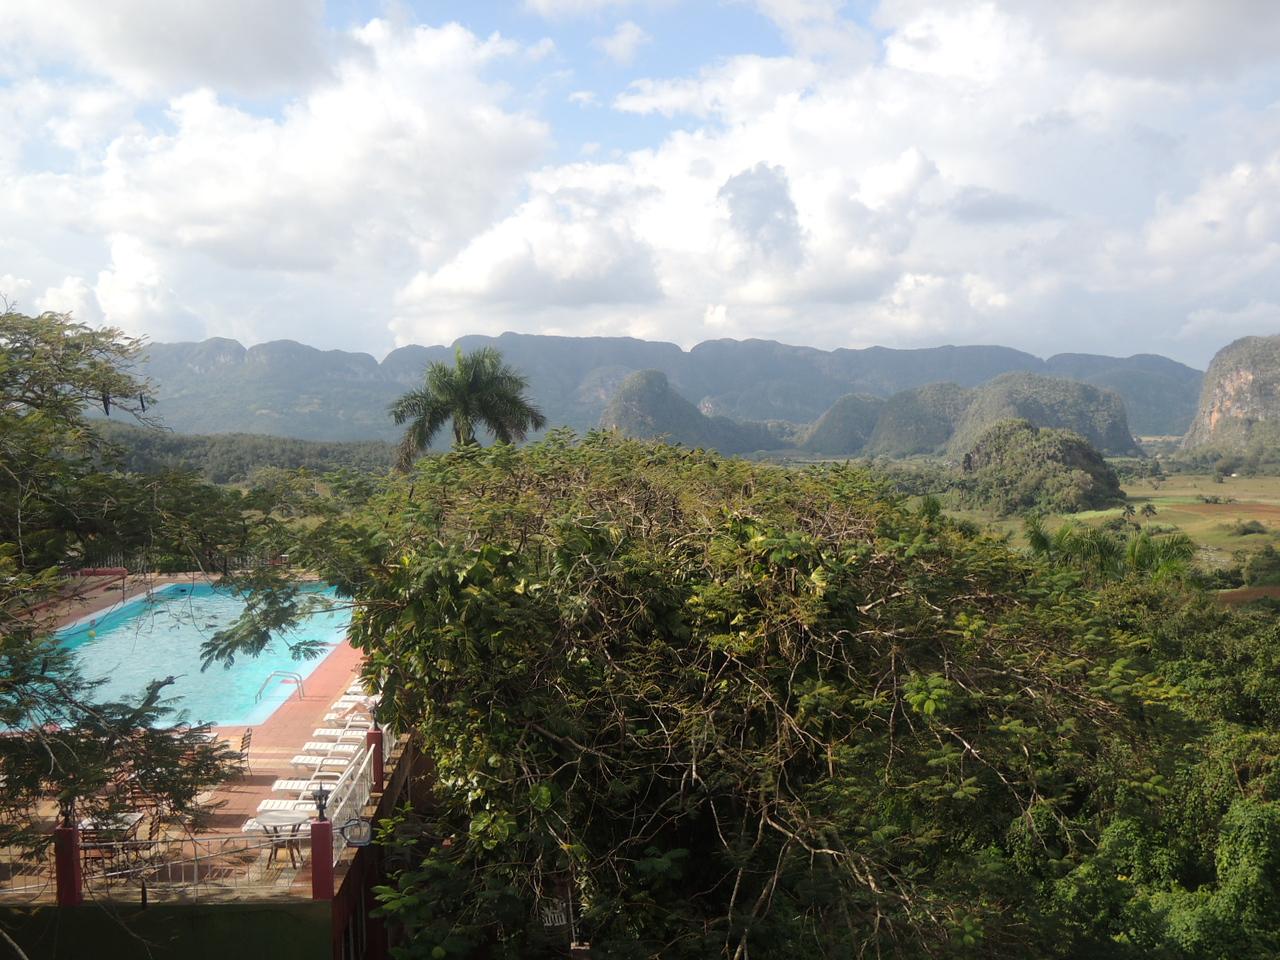 Looking across the hotel pool in Pinar del Rio.